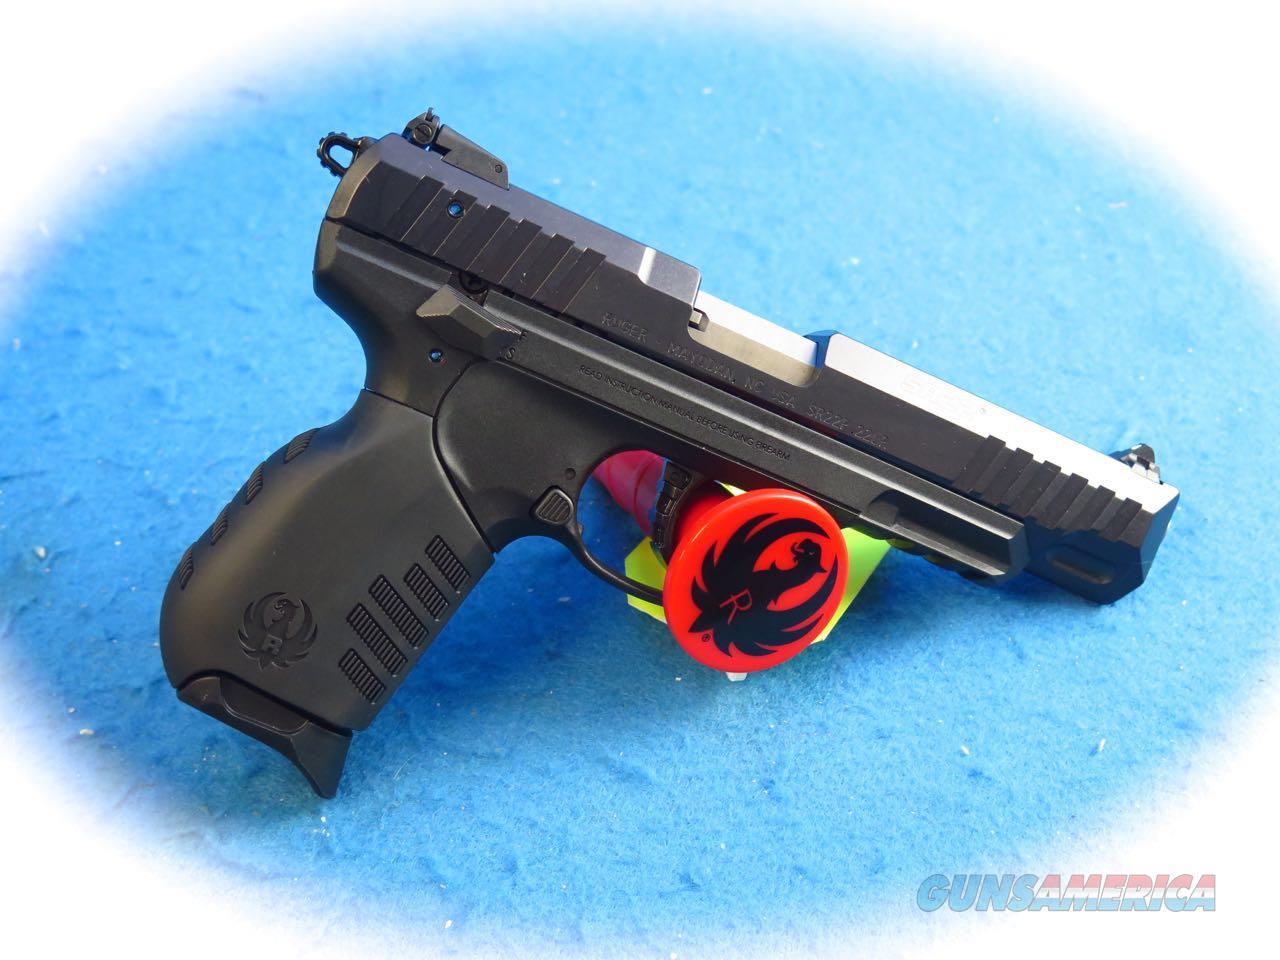 Ruger SR22 .22LR Semi Auto Pistol 4.5 BBL Model 3620 **New**  Guns > Pistols > Ruger Semi-Auto Pistols > SR Family > SR22